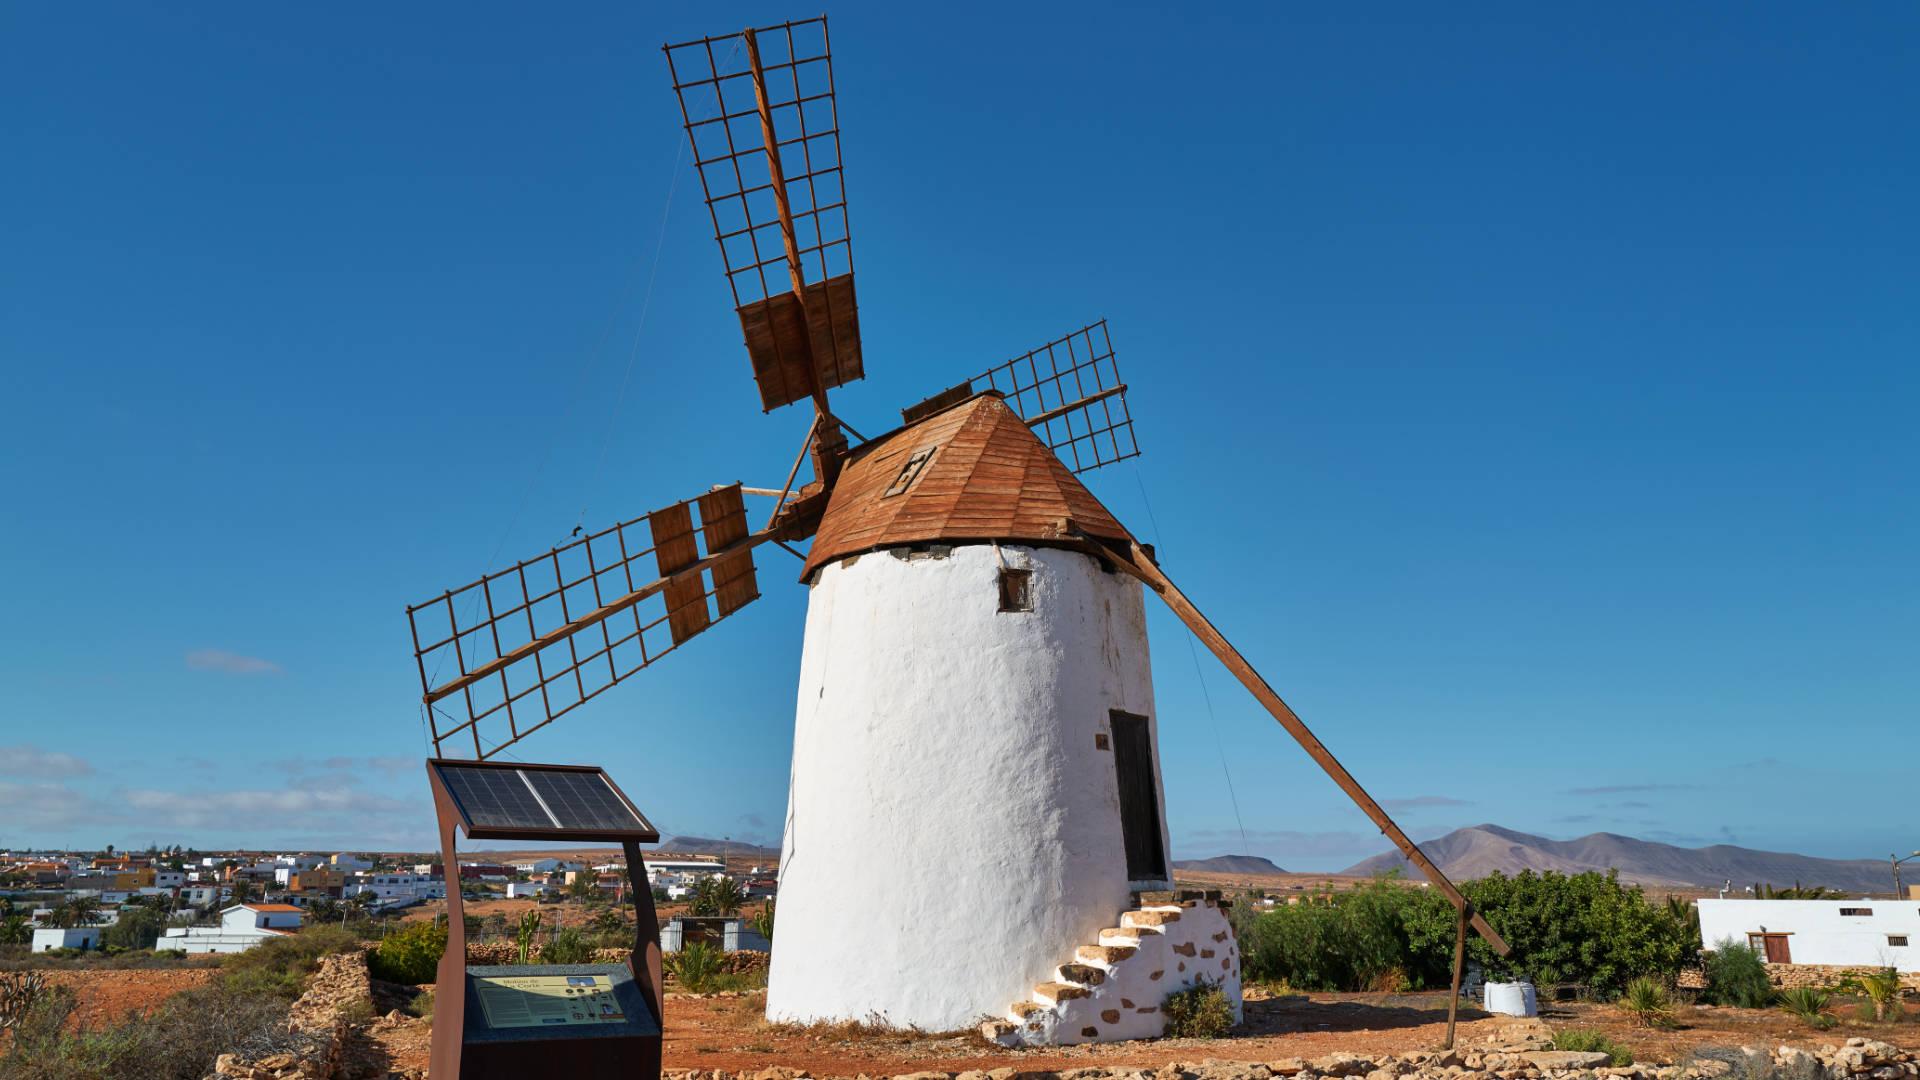 Molino de la Corte Tiscamanita Fuerteventura.